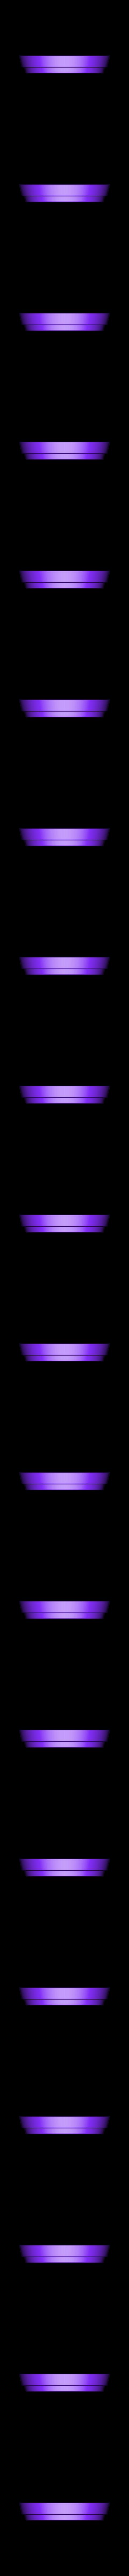 3dpa.STL Download STL file Flowerpot • 3D printing model, 3dmodelsByVadim